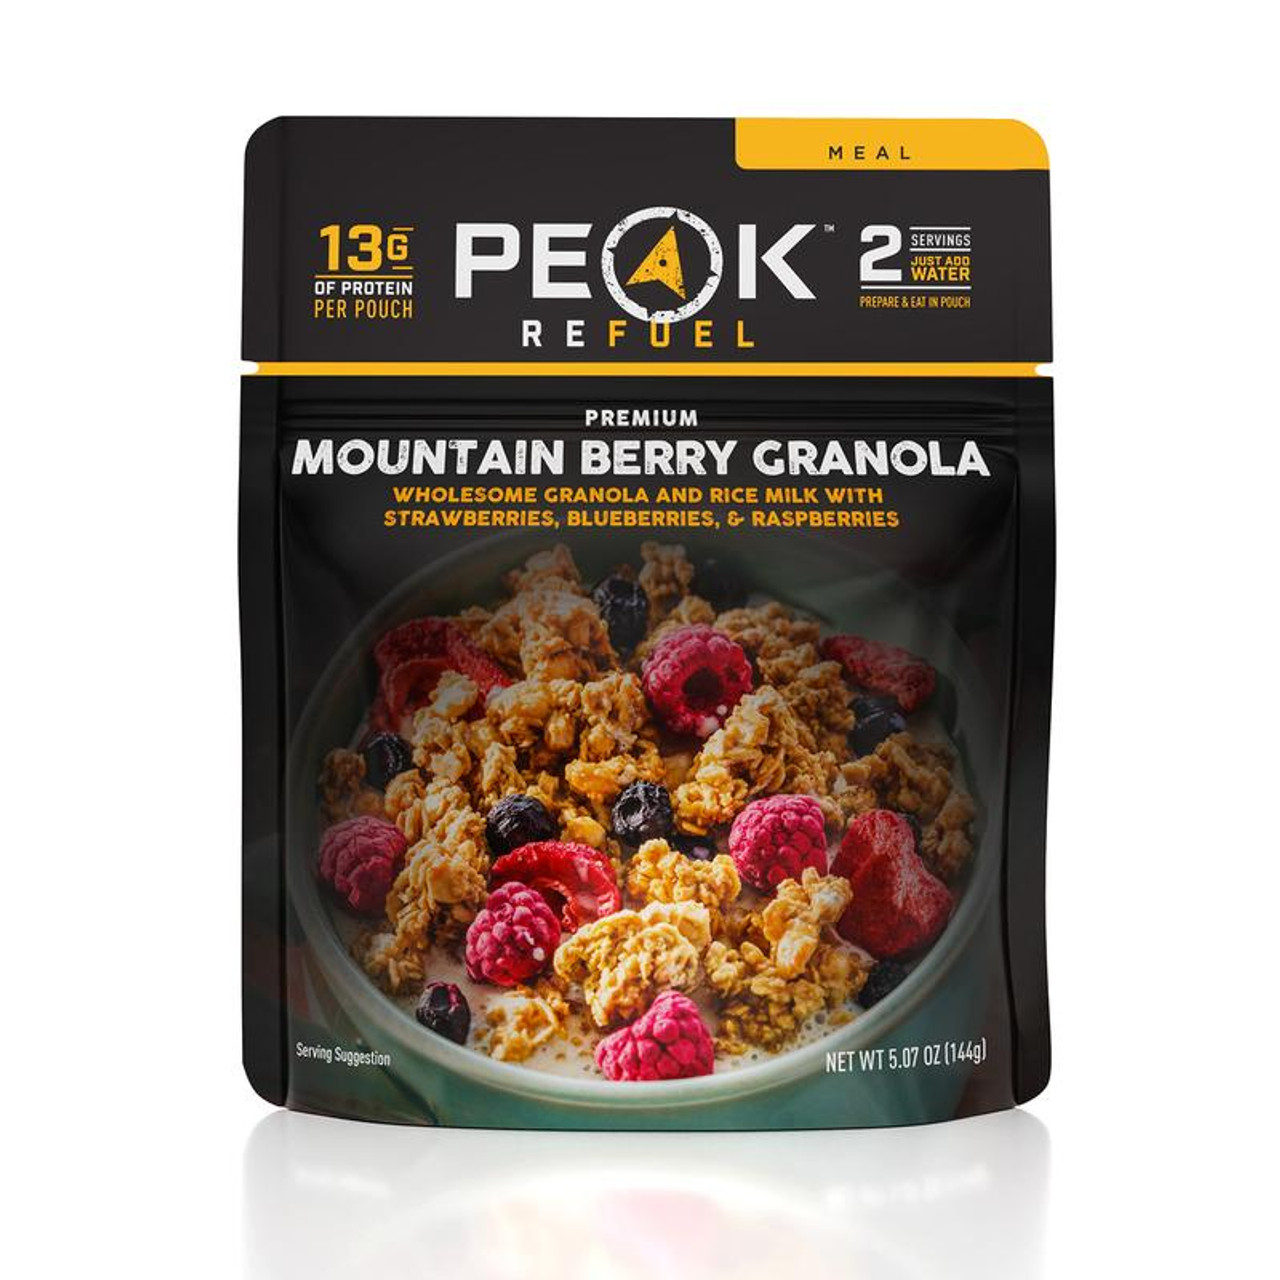 Peak Refuel Mountain Berry Granola